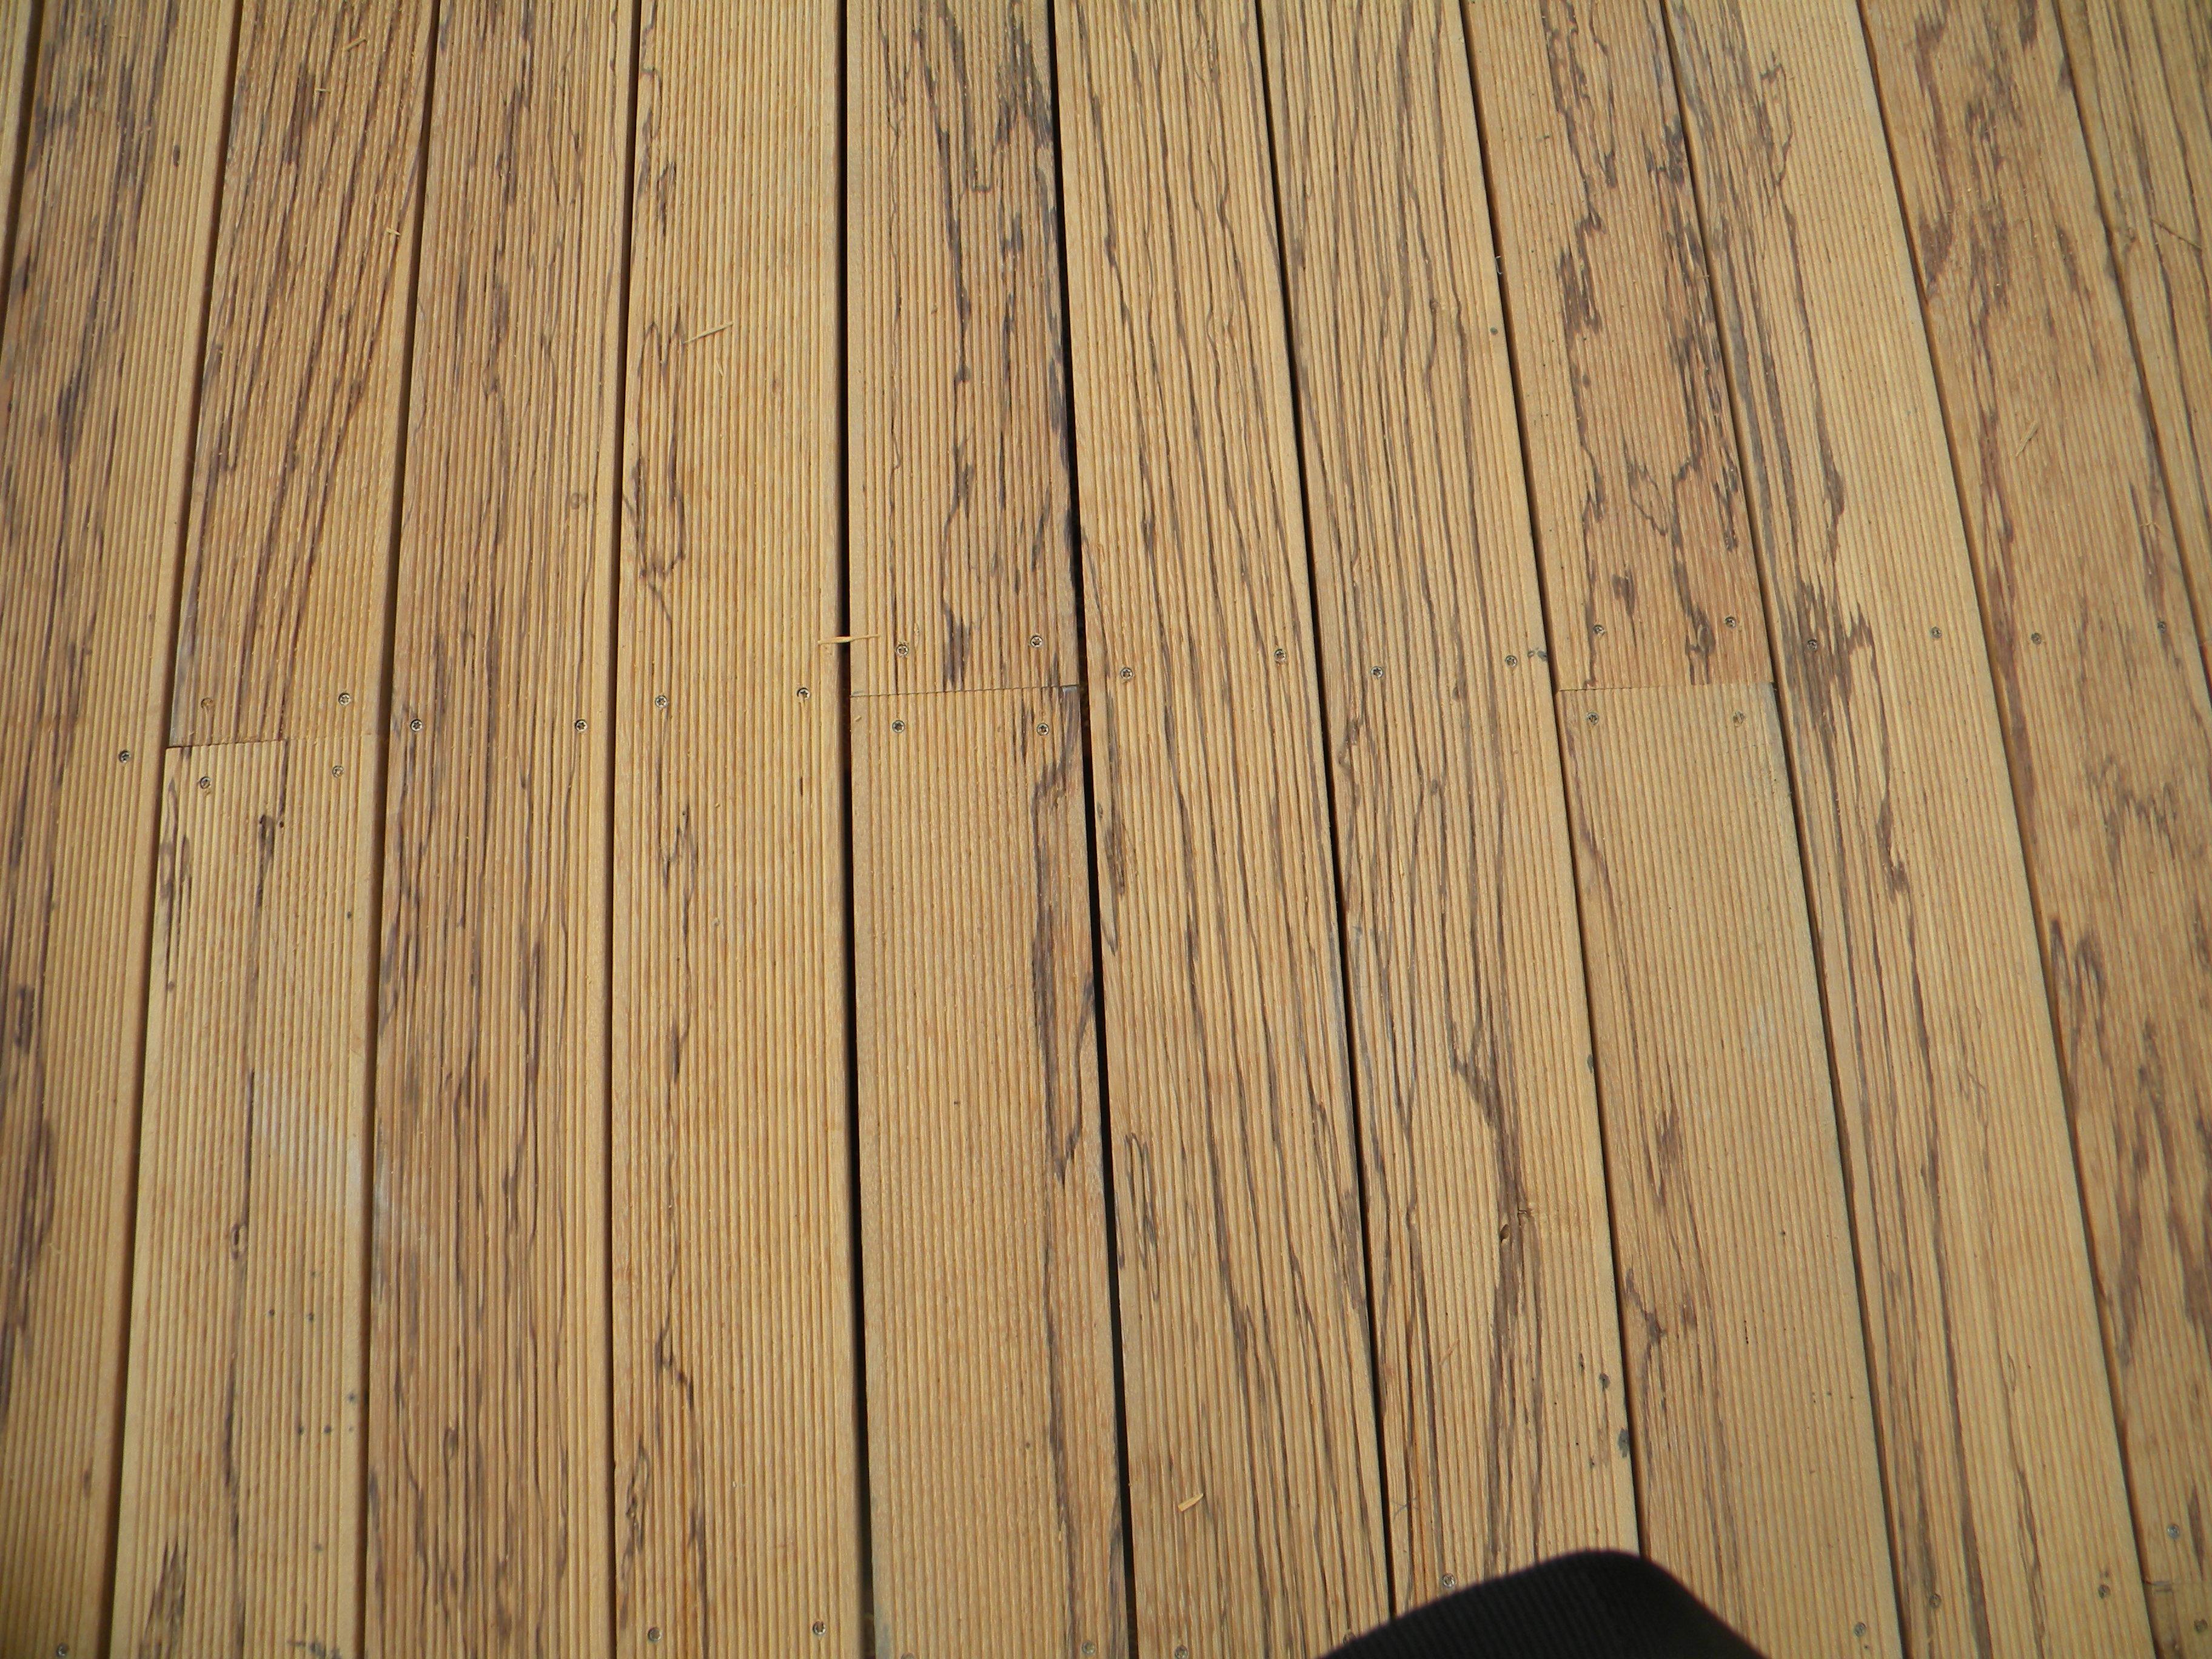 Deck-uri lemn - Angelim Rajado SELVA FLOORS - Poza 40